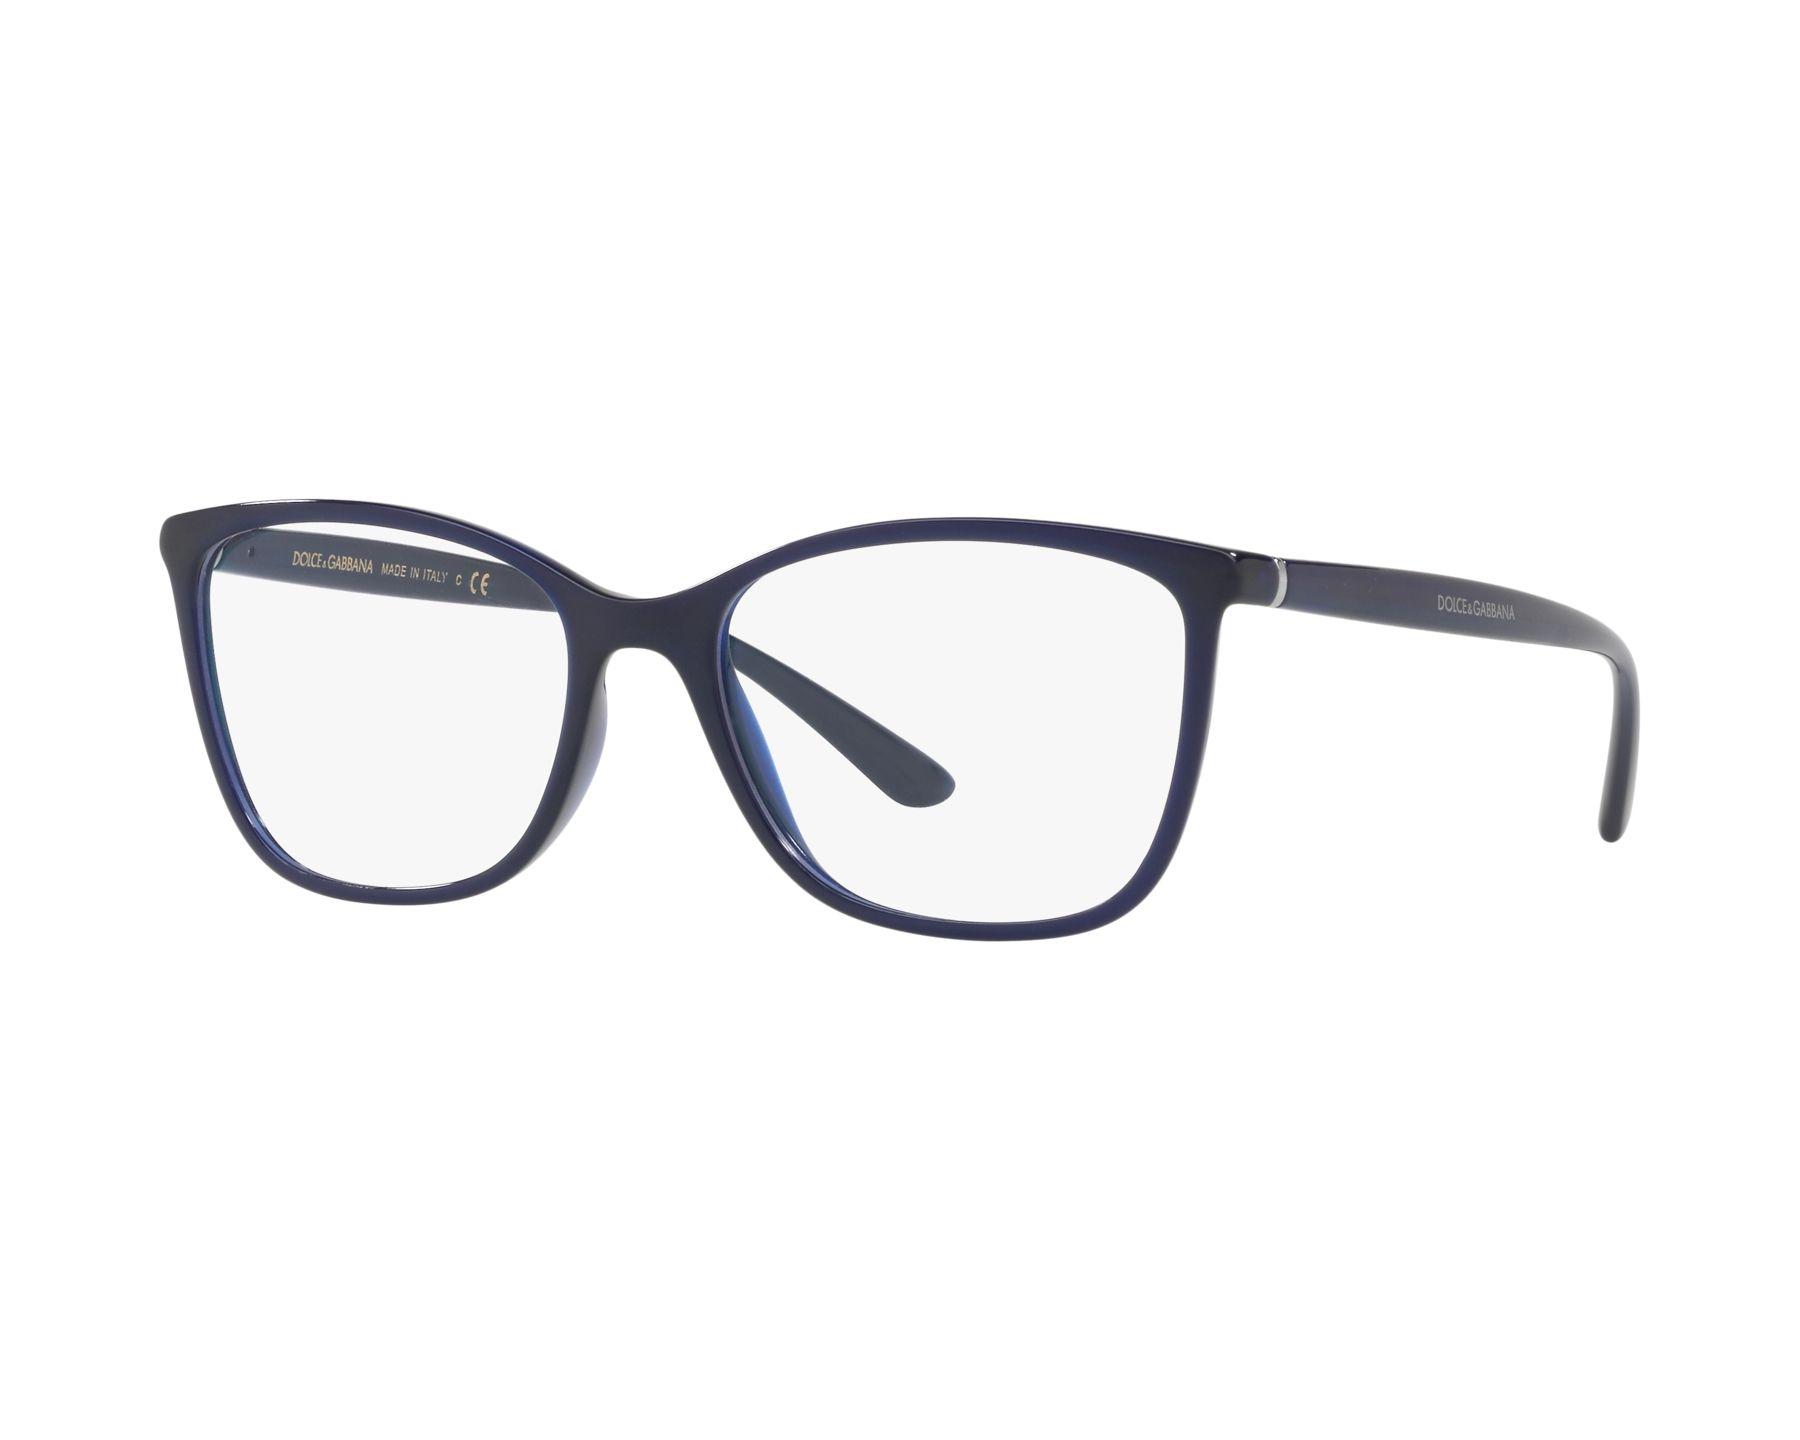 92bc907b4f8 eyeglasses Dolce   Gabbana DG-5026 3094 54-17 Blue